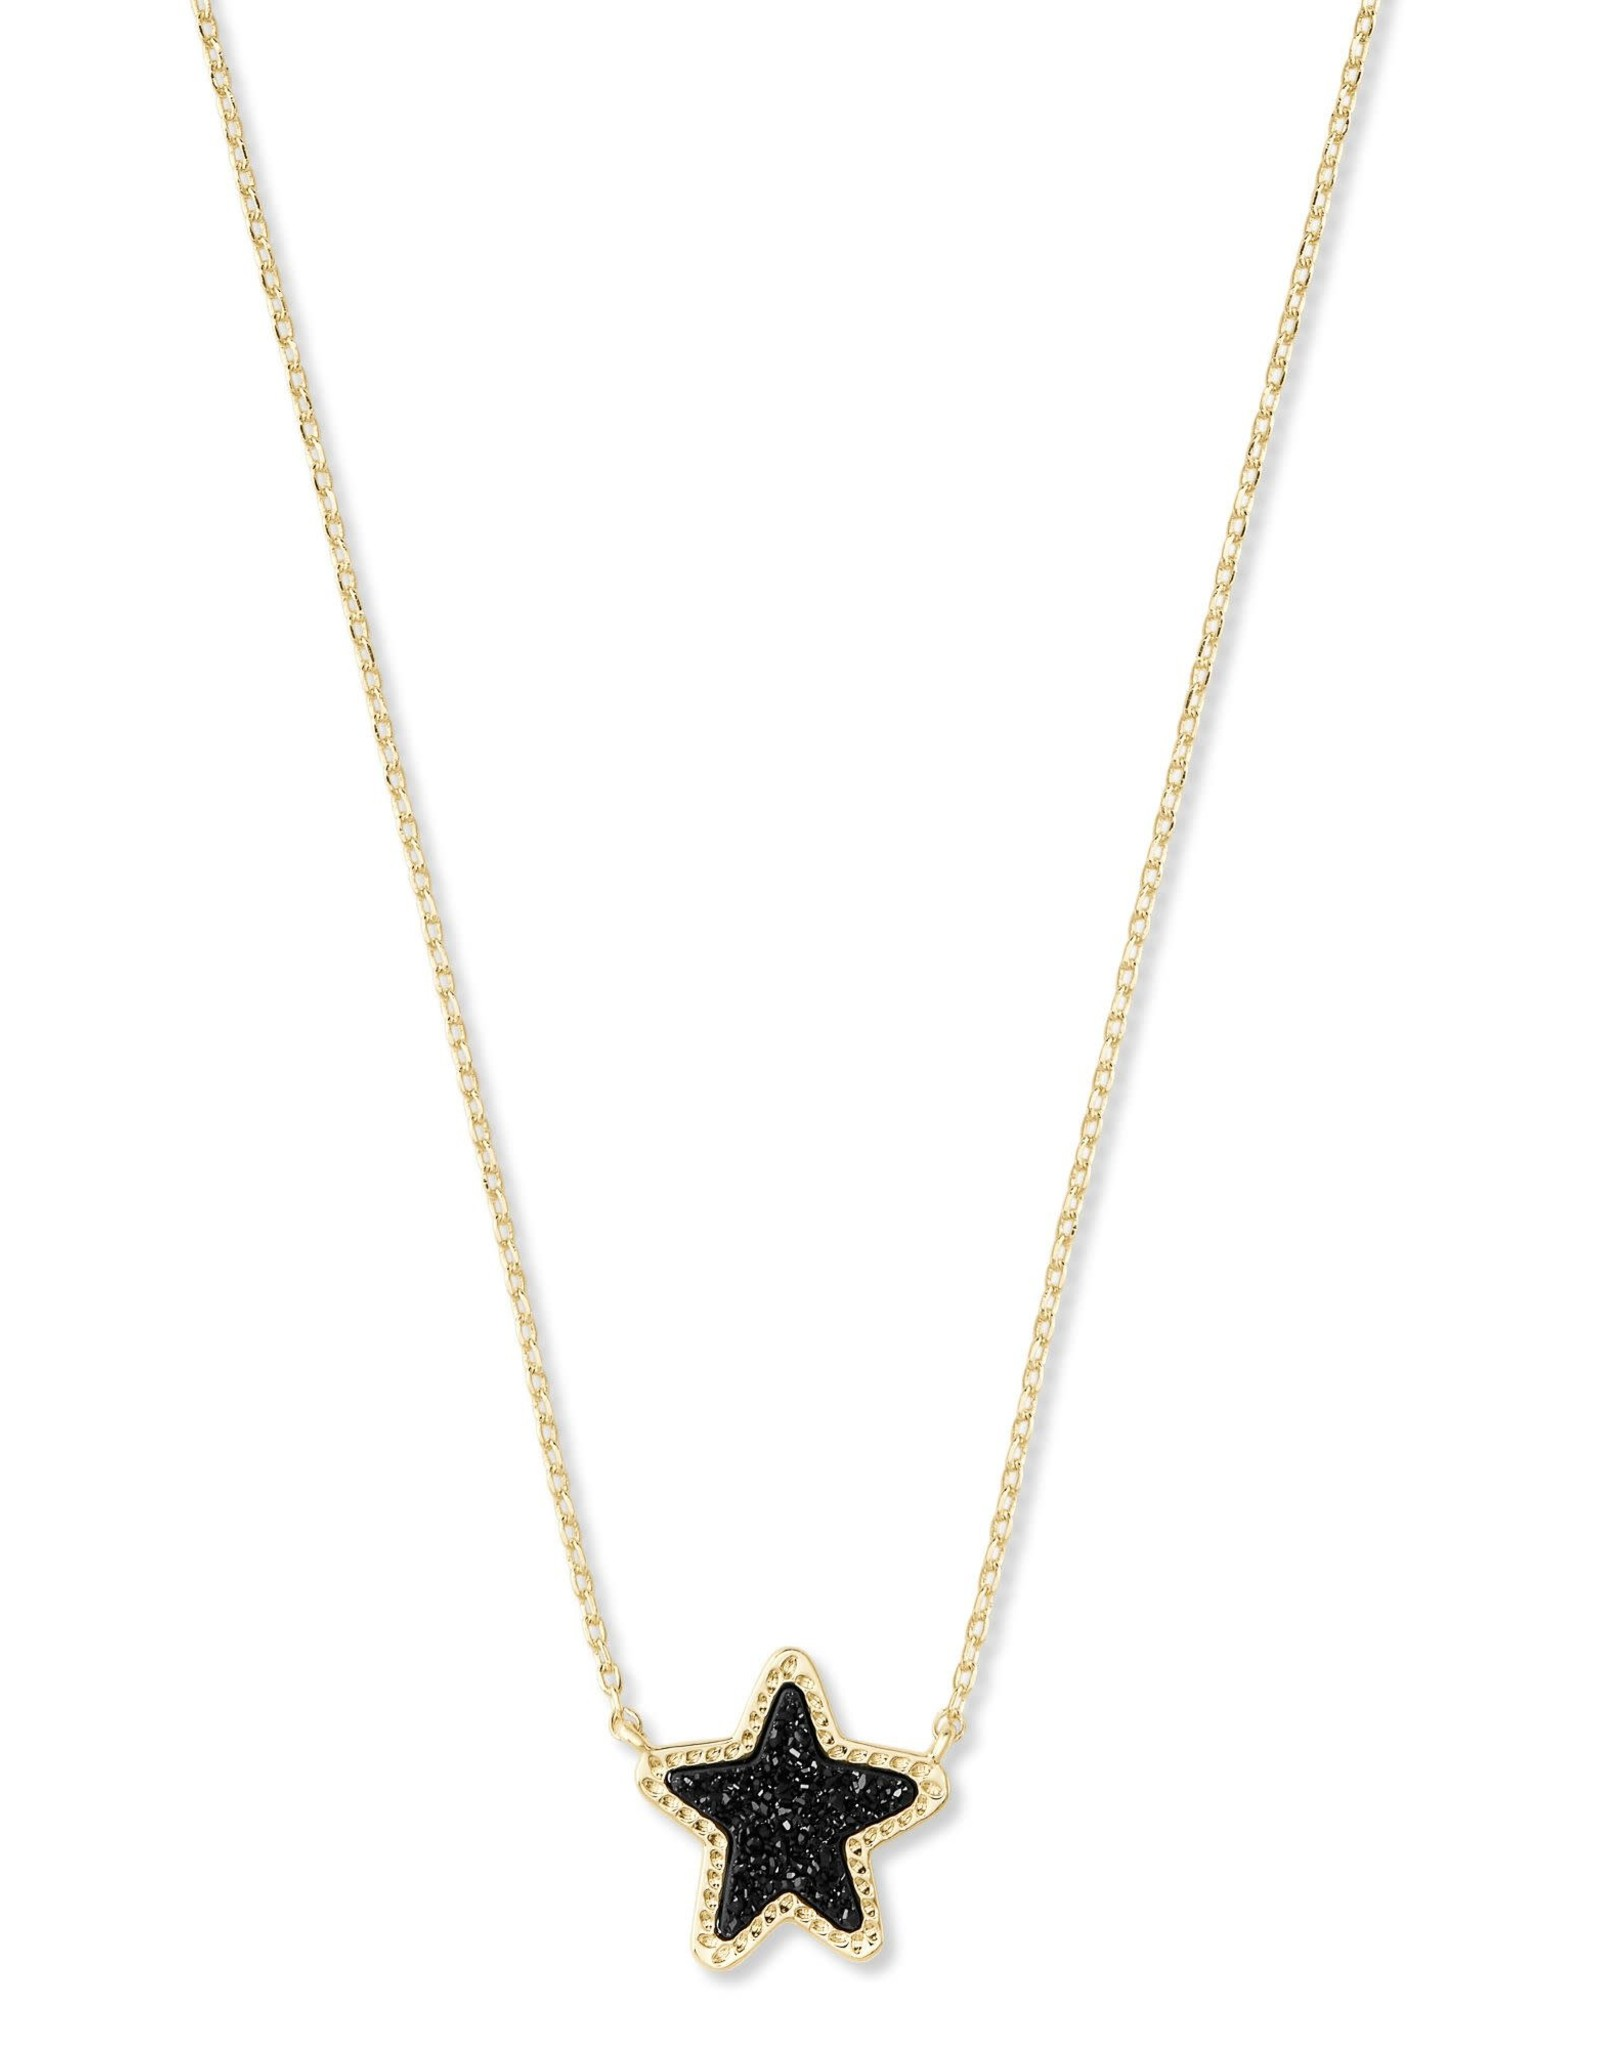 Kendra Scott Jae Star Short Pendant - Black Drusy/Gold